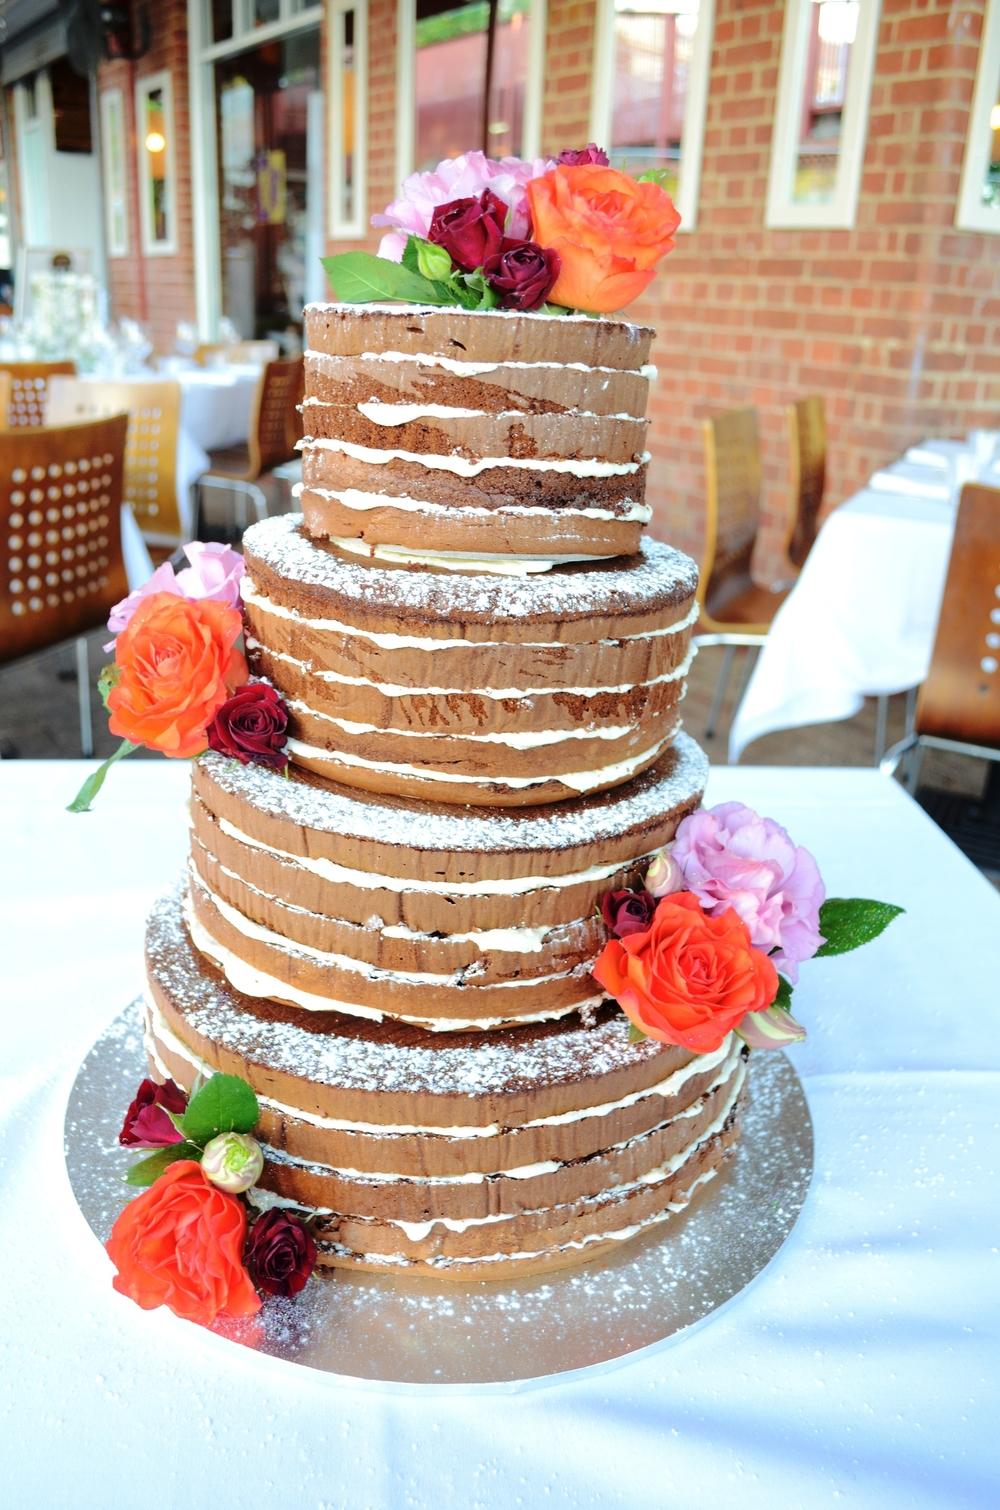 Vanilla Pod wedding cake chocolate saponge with vanilla crea, and fresh flowers by bouquet boutique.JPG